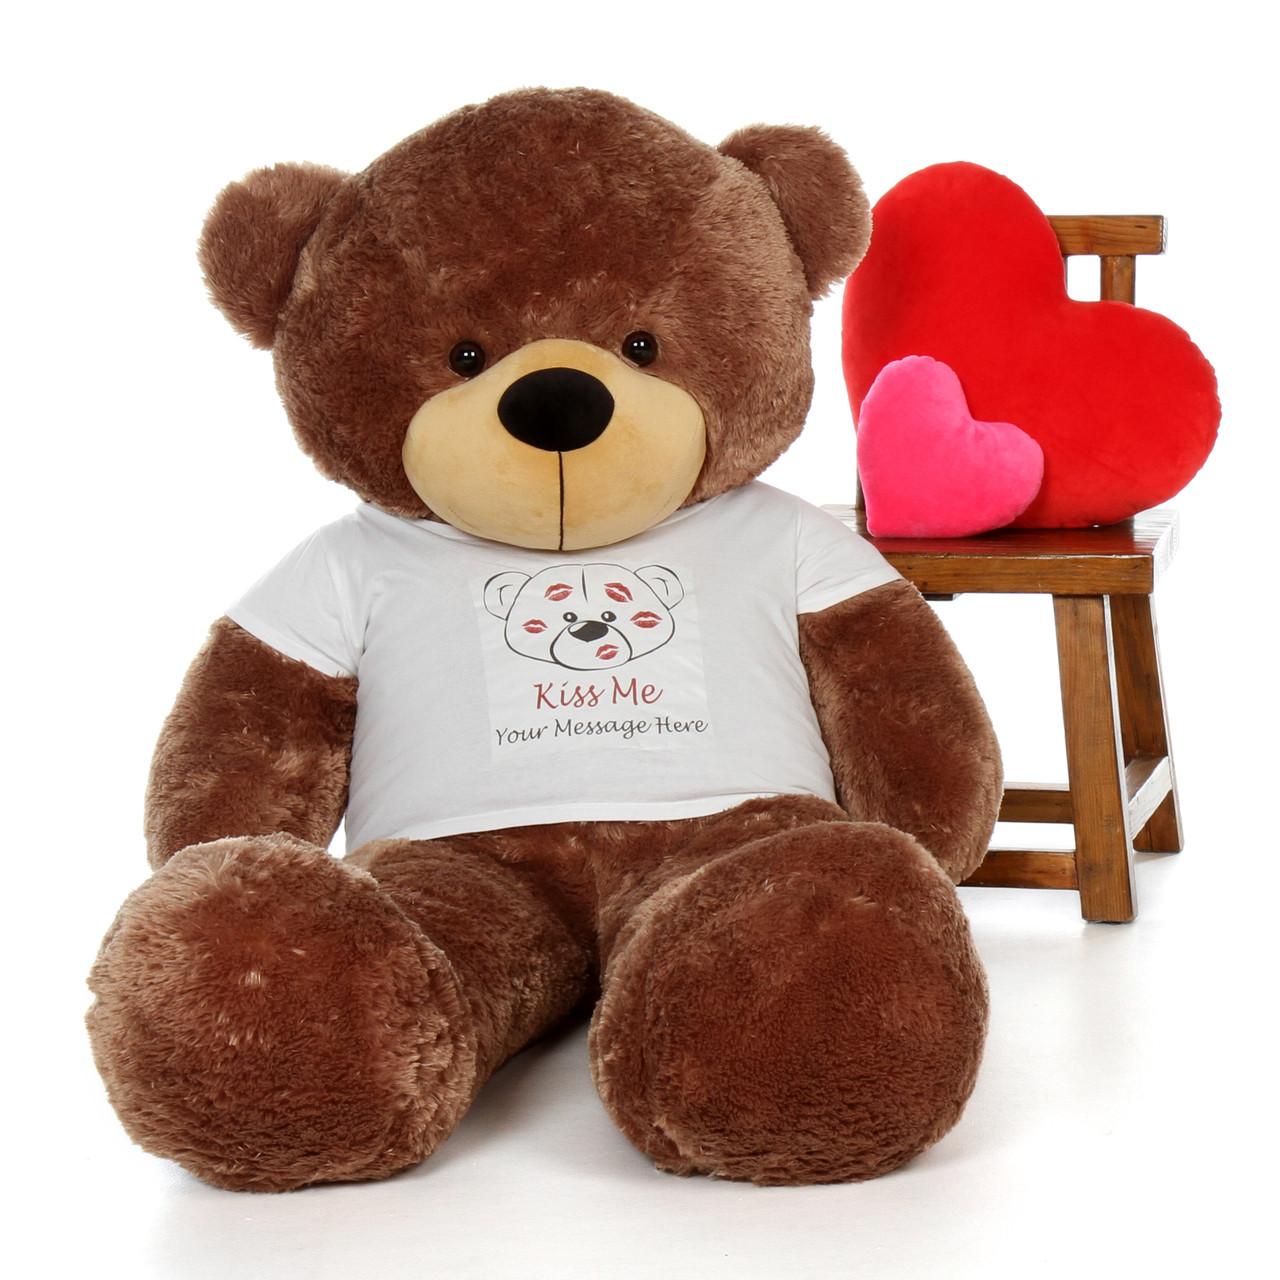 5ft Sunny Cuddles Mocha Brown Teddy Bear in Valentine's Day Kiss Me Shirt